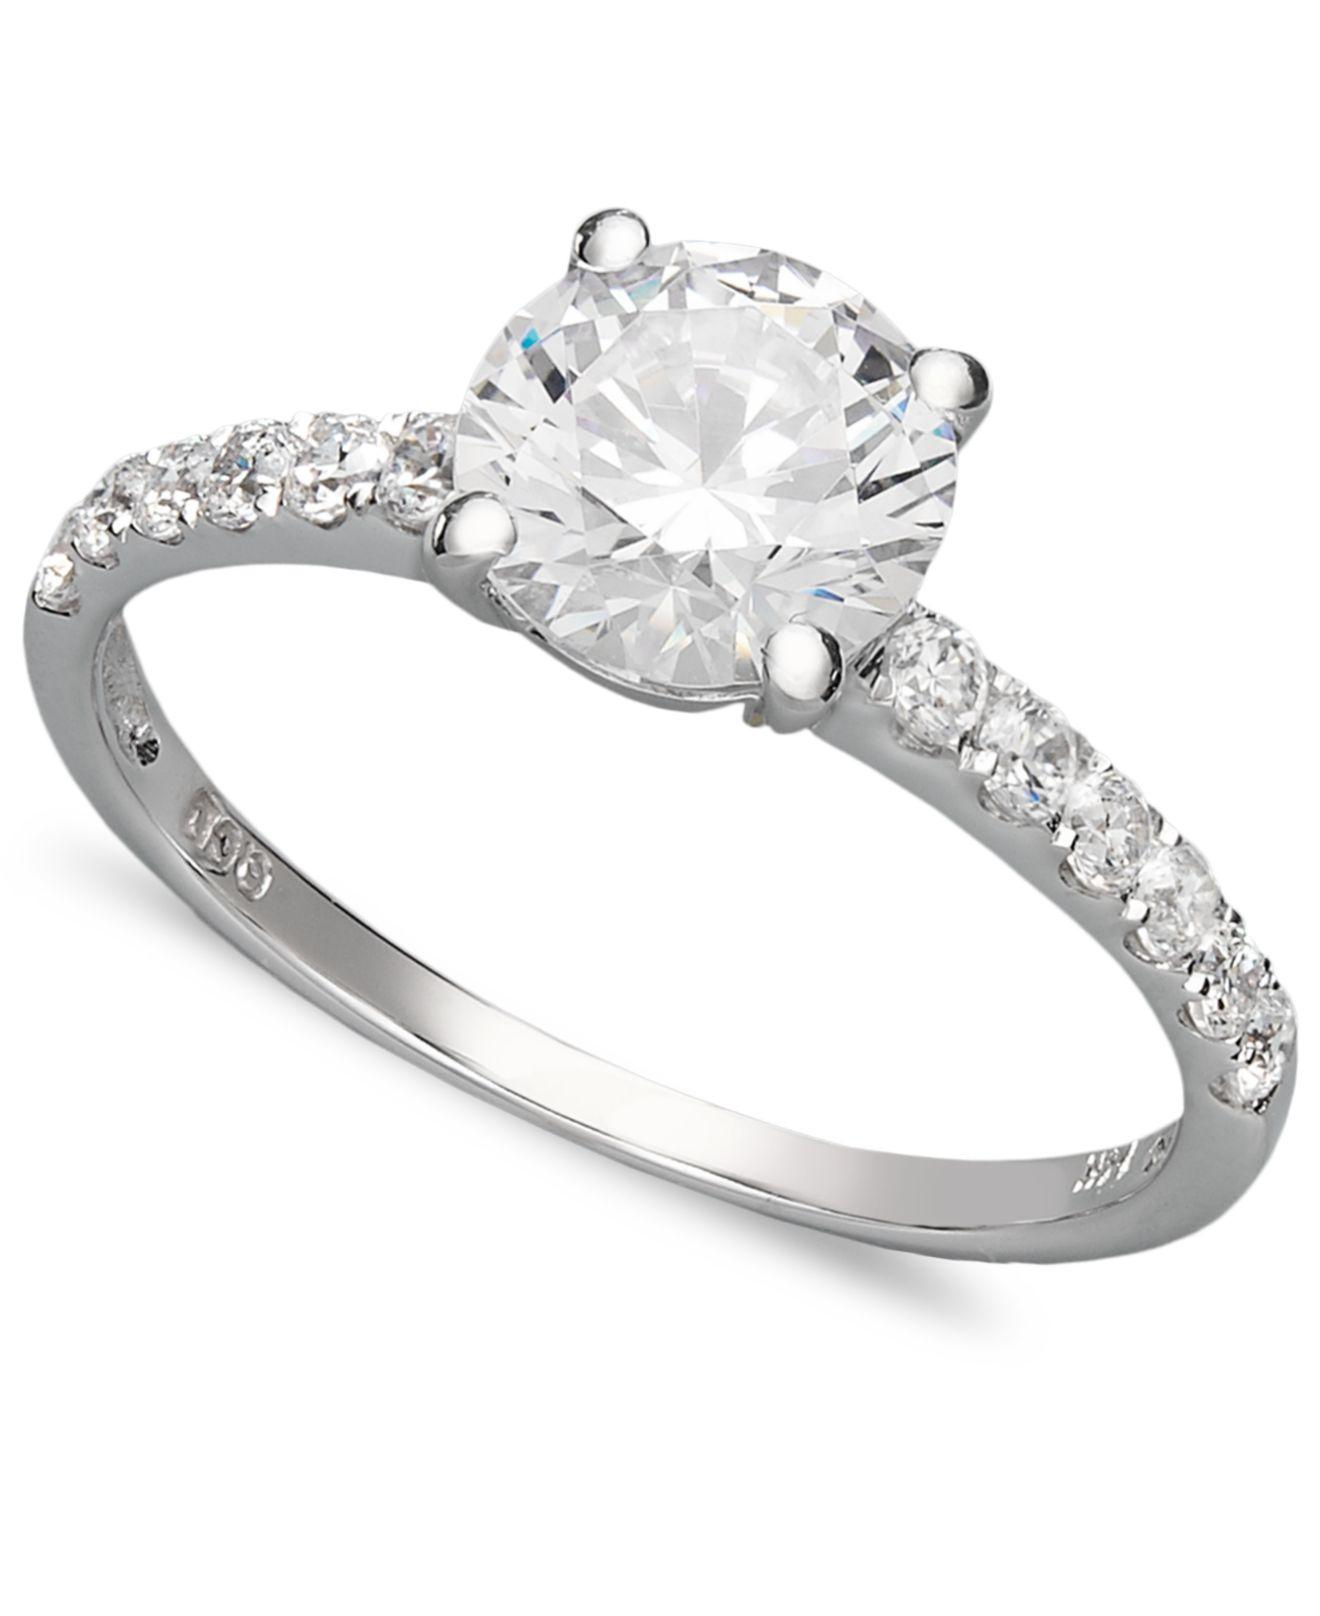 arabella swarovski zirconia wedding ring 2 3 4 ct t w. Black Bedroom Furniture Sets. Home Design Ideas